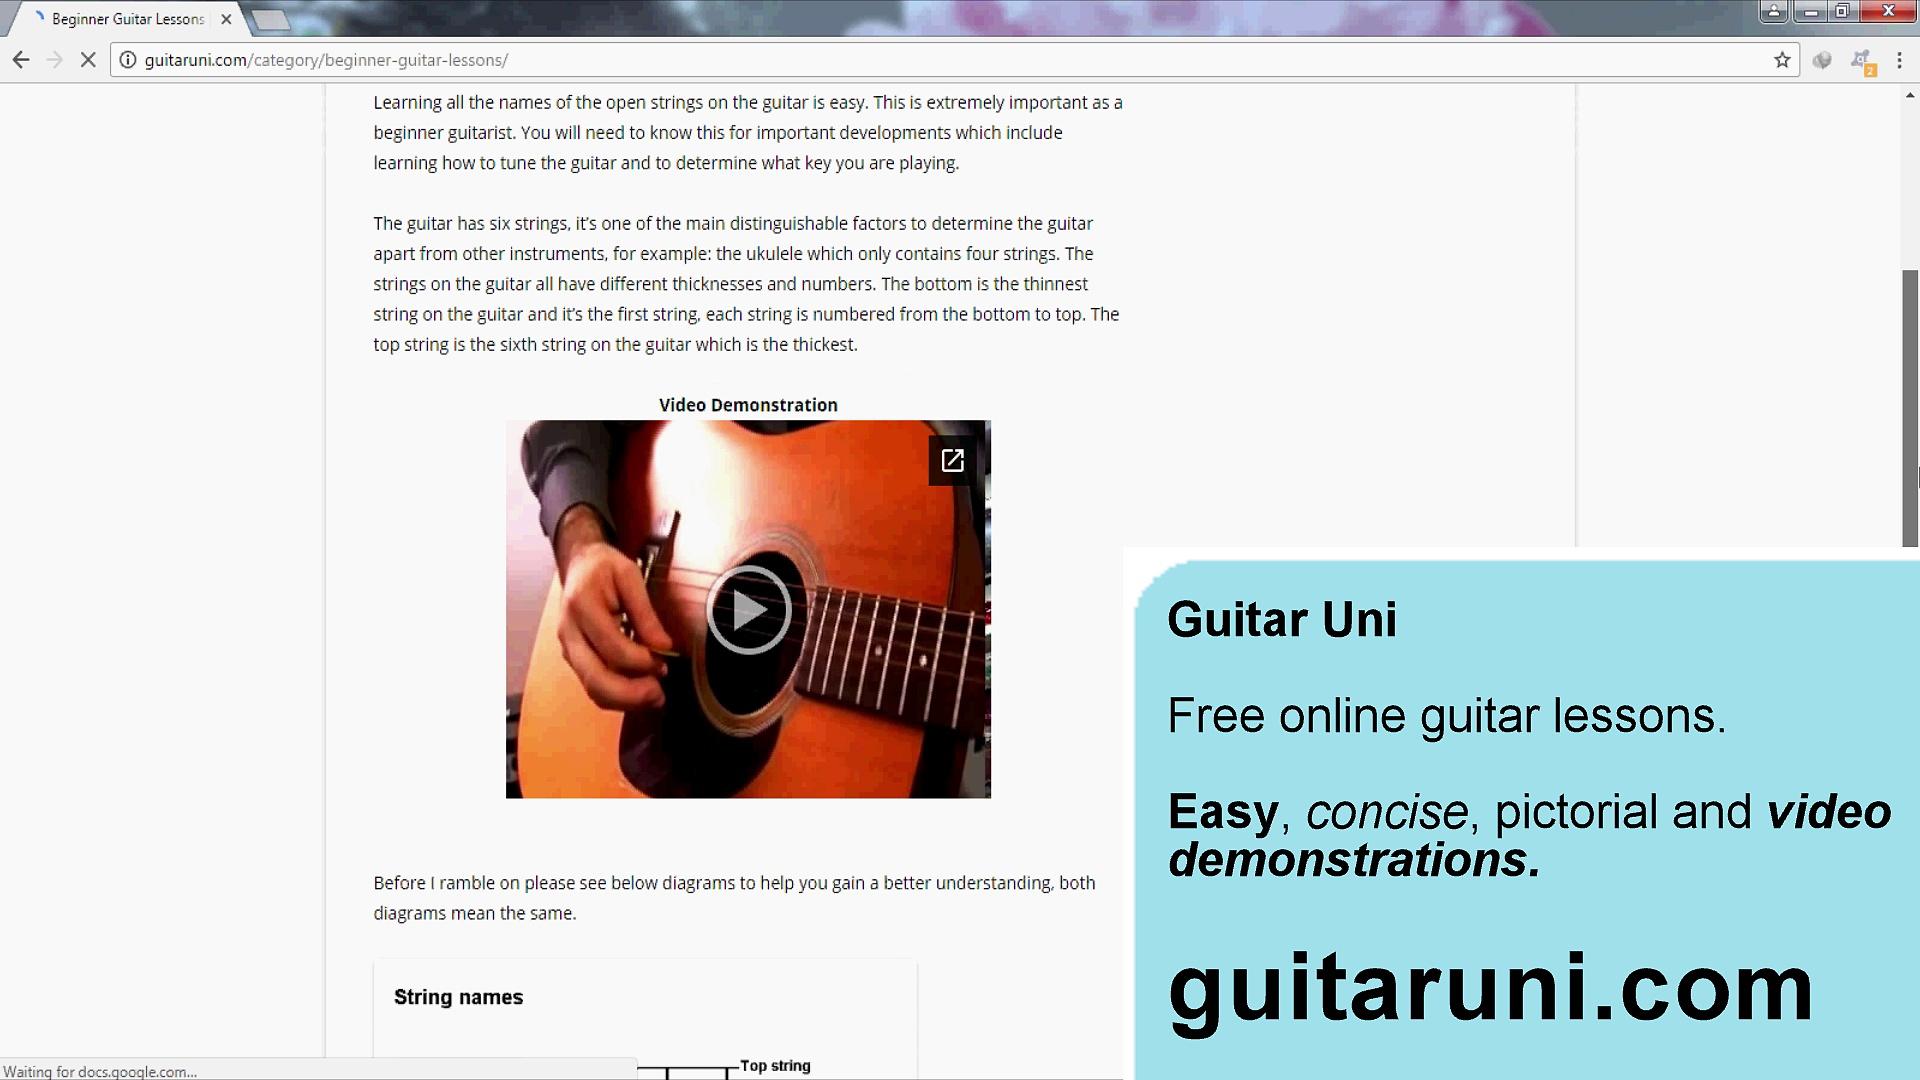 Guitar Uni – Free Online Guitar Lessons